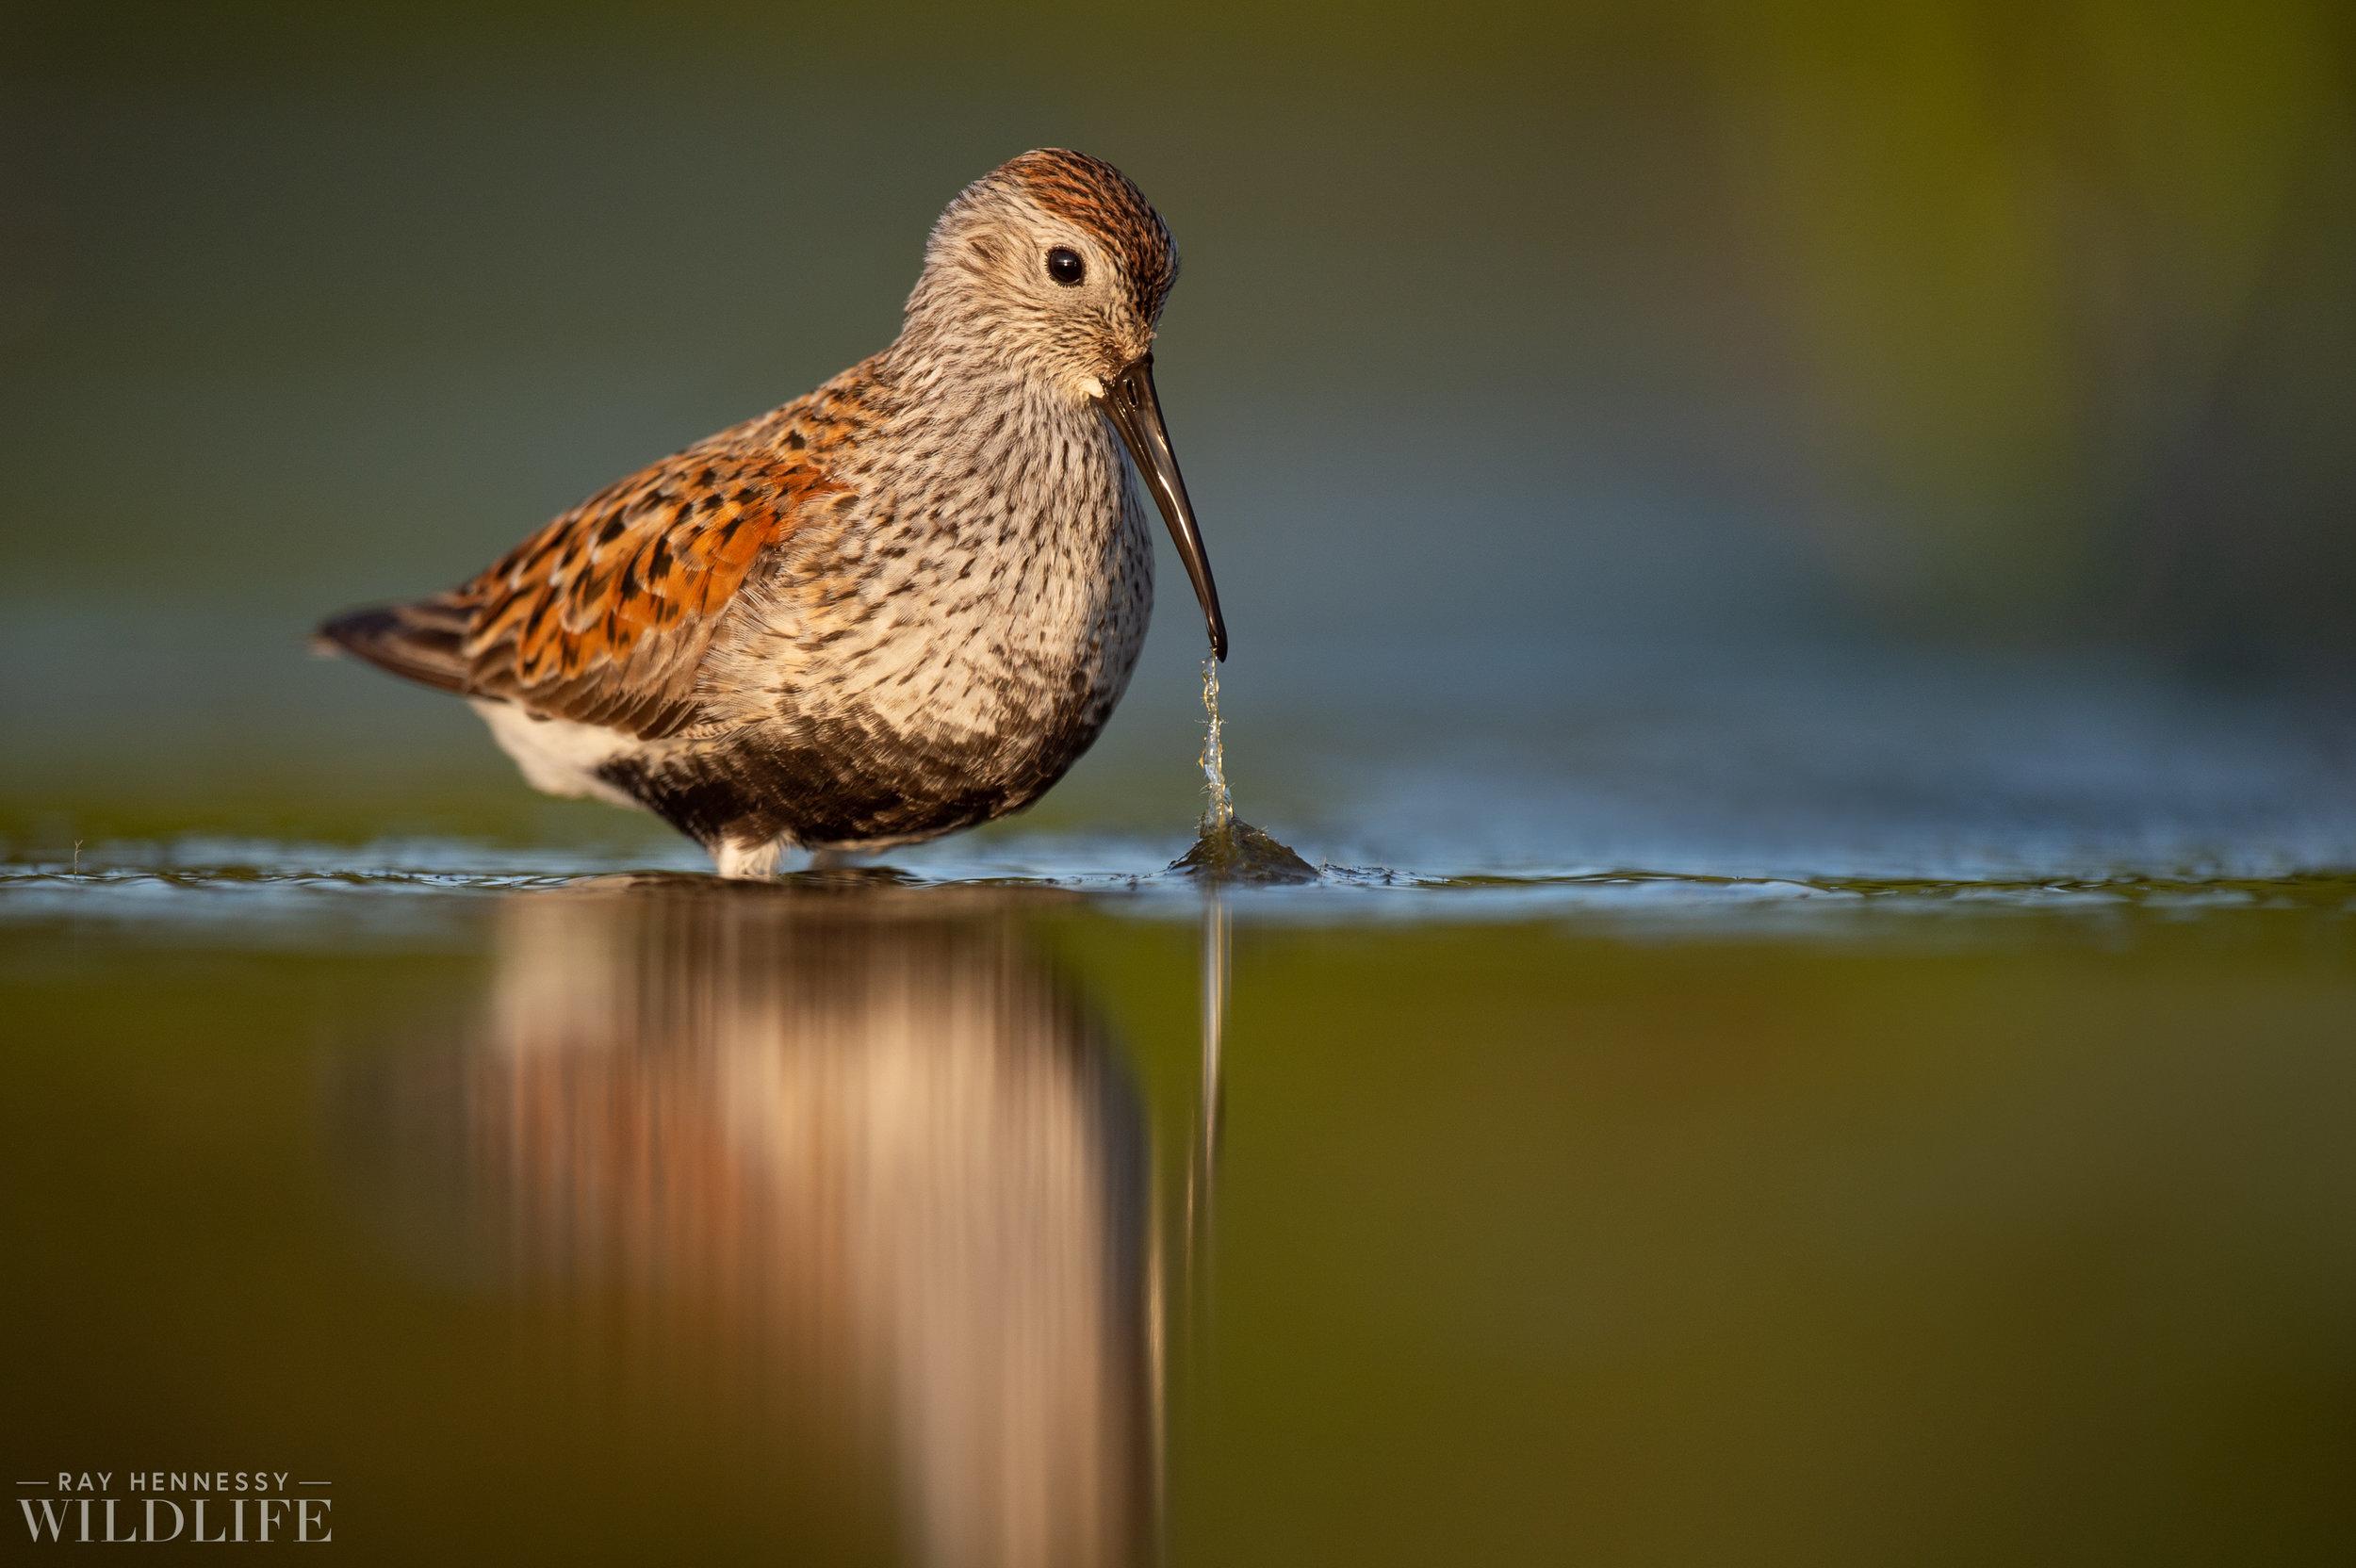 013_shorebirds-prothonotary-warbler.jpg